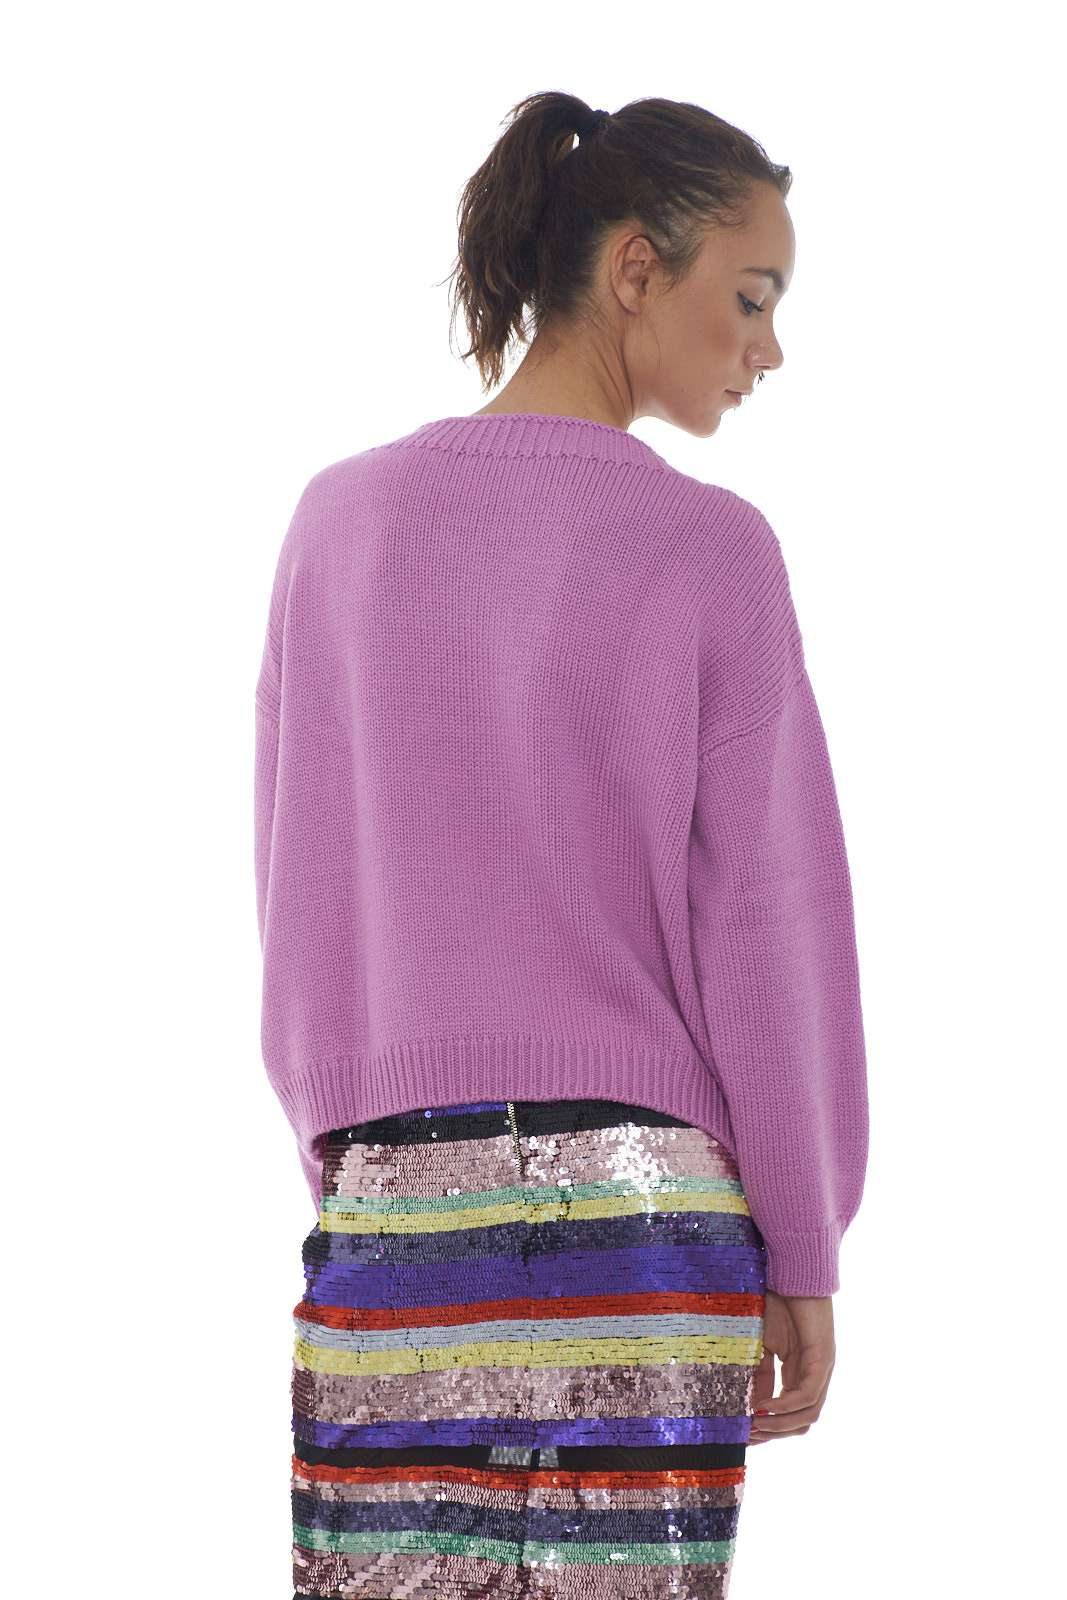 https://www.parmax.com/media/catalog/product/a/i/AI-outlet_parmax-maglia-donna-Miki-Za-MZKW00048-C.jpg